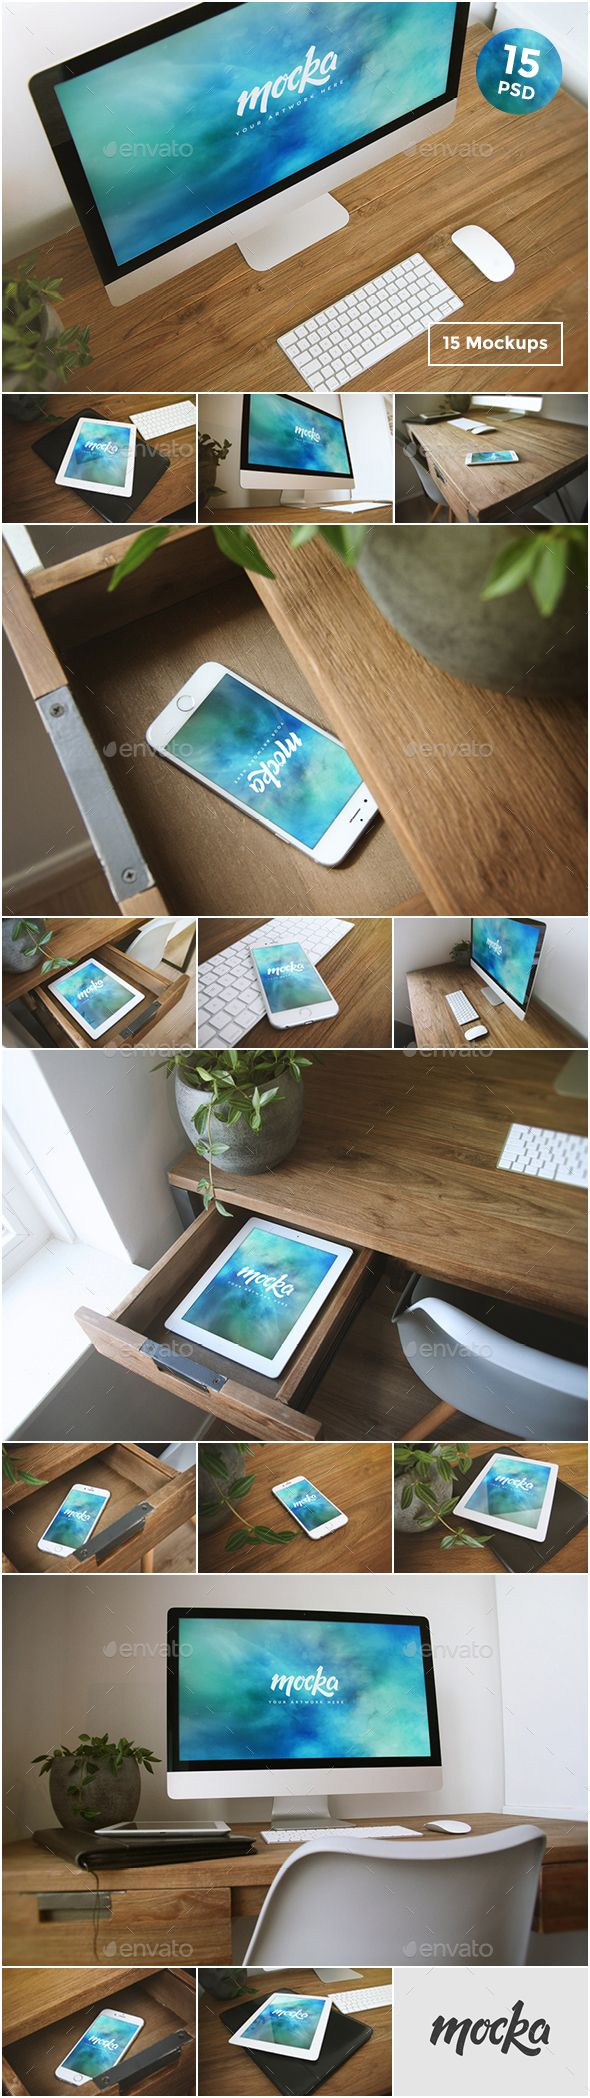 15 Desktop, Tablet & Phone Mockups. Download here: http://graphicriver.net/item/15-desktop-tablet-phone-mockups/15617030?ref=ksioks